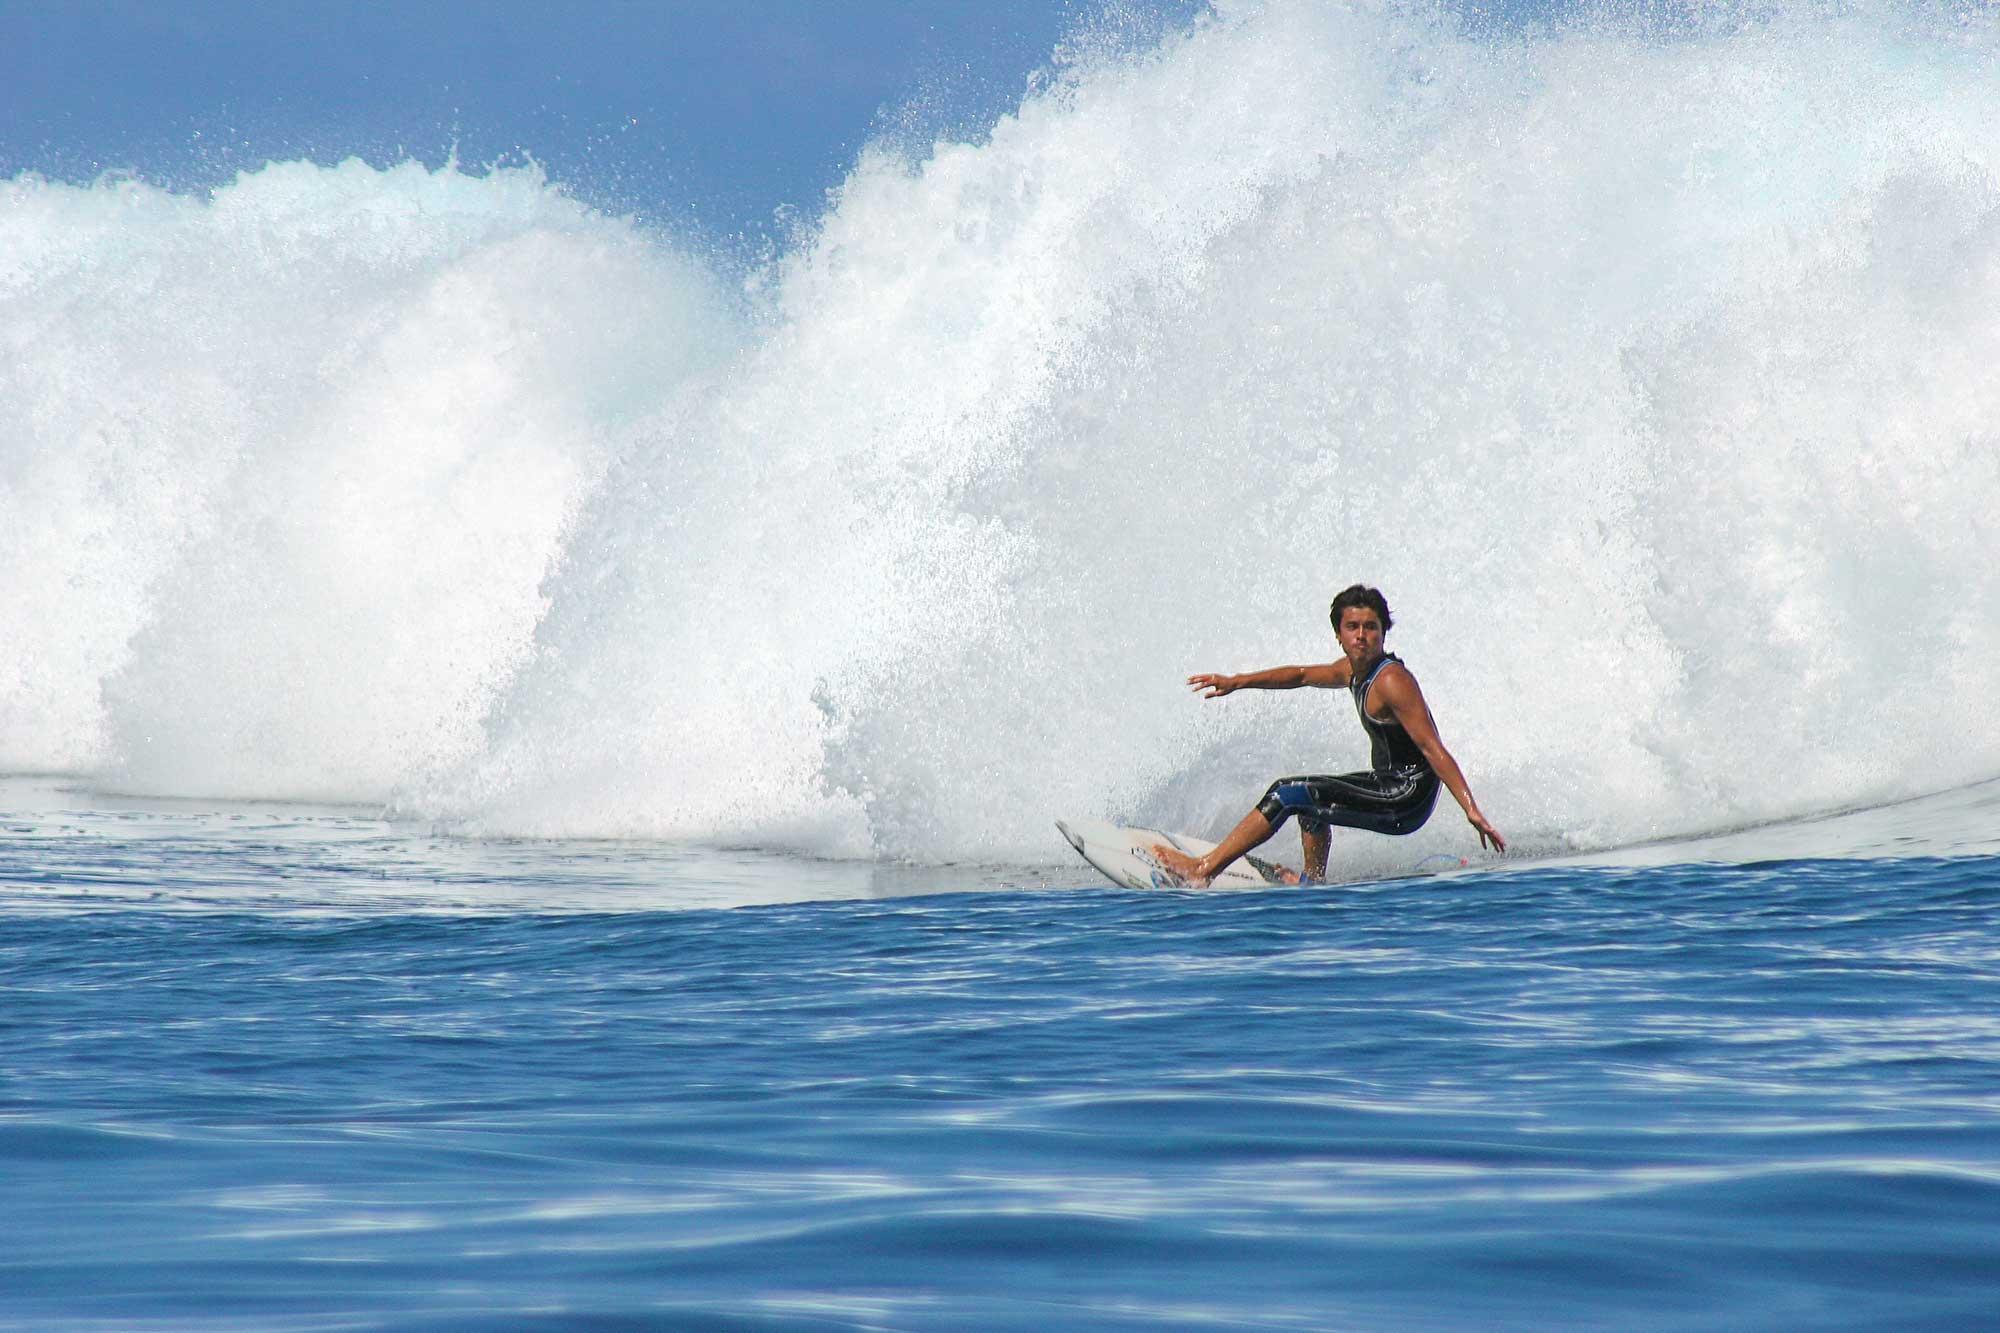 surfing-teahupoo-tahiti-frenchpolynesia-3